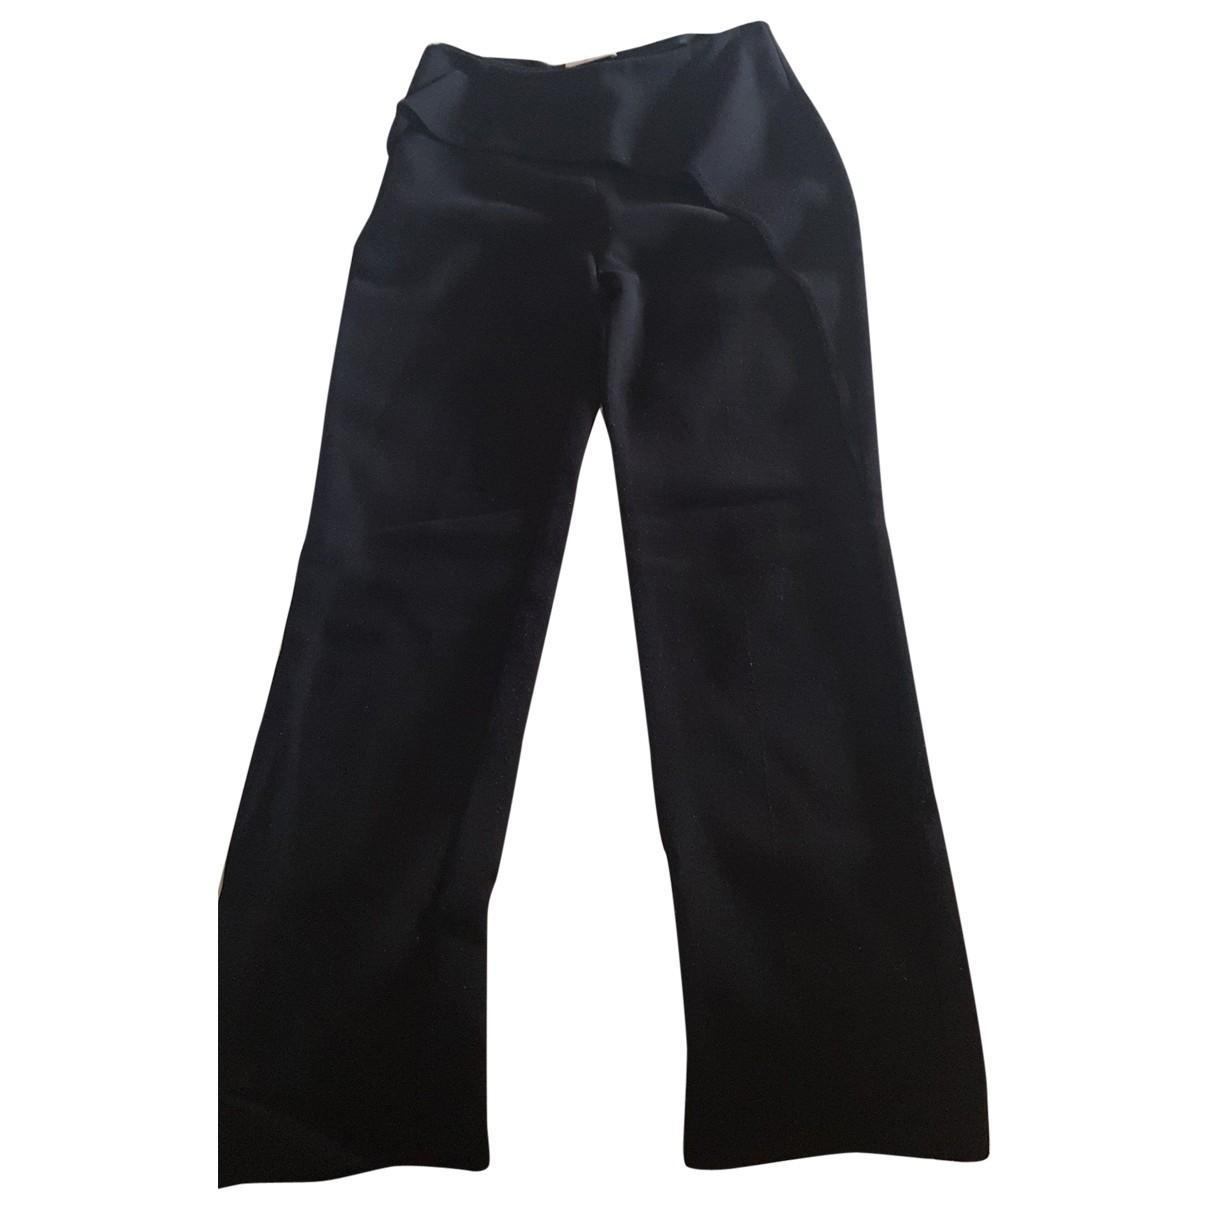 Balenciaga N Black Cotton Trousers for Women 38 FR